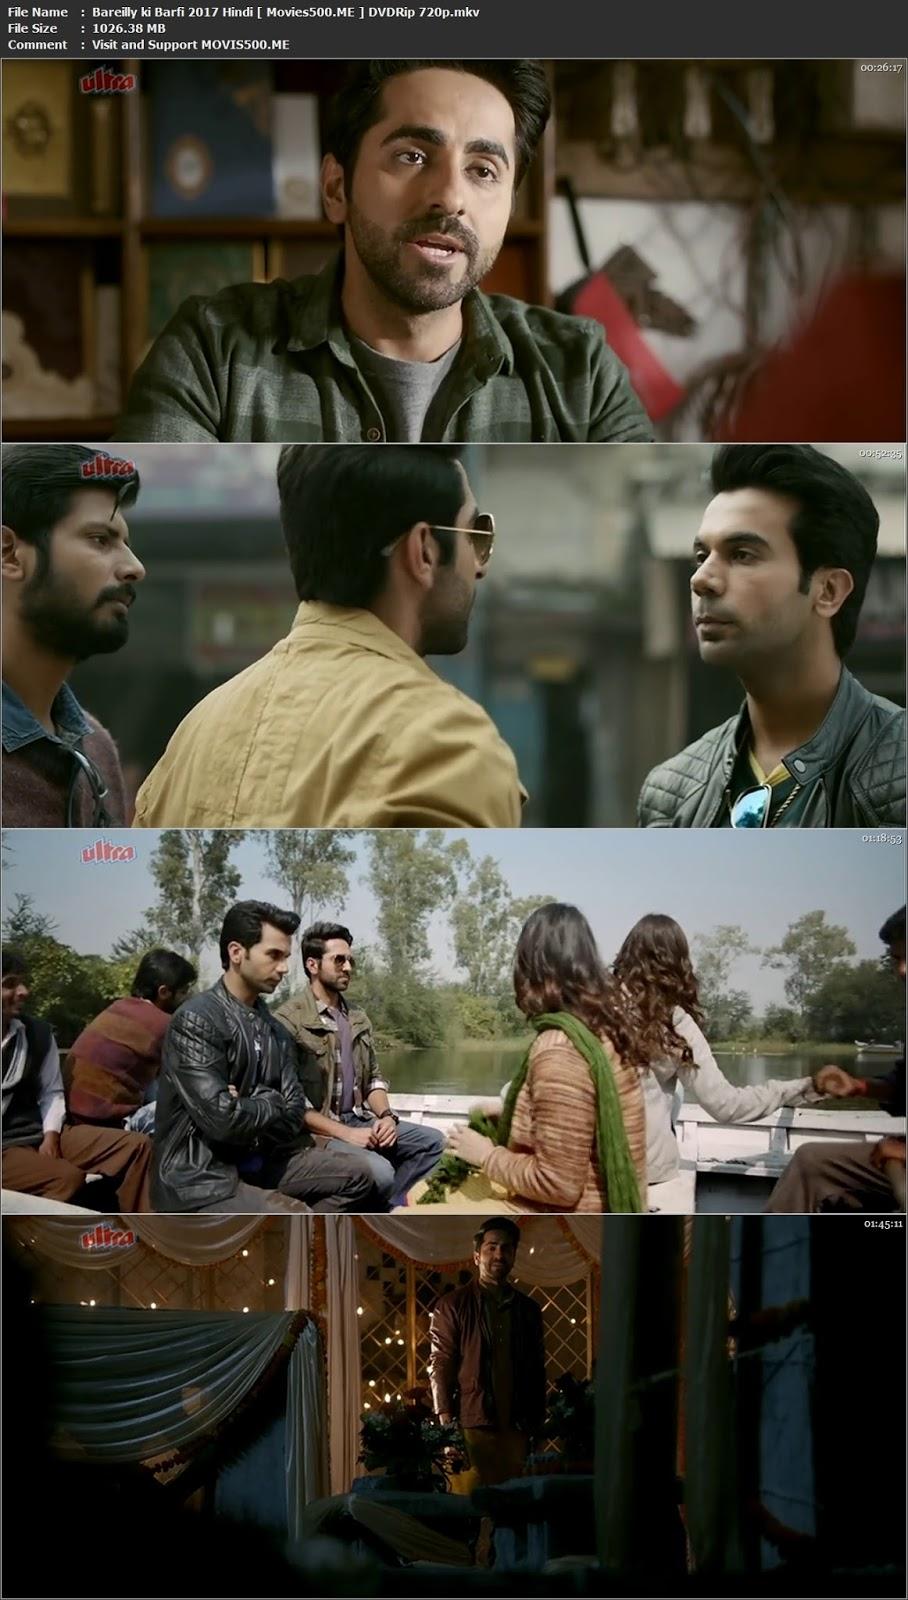 Bareilly Ki Barfi 2017 Hindi Full Movie DVDRip 720p at tokenguy.com